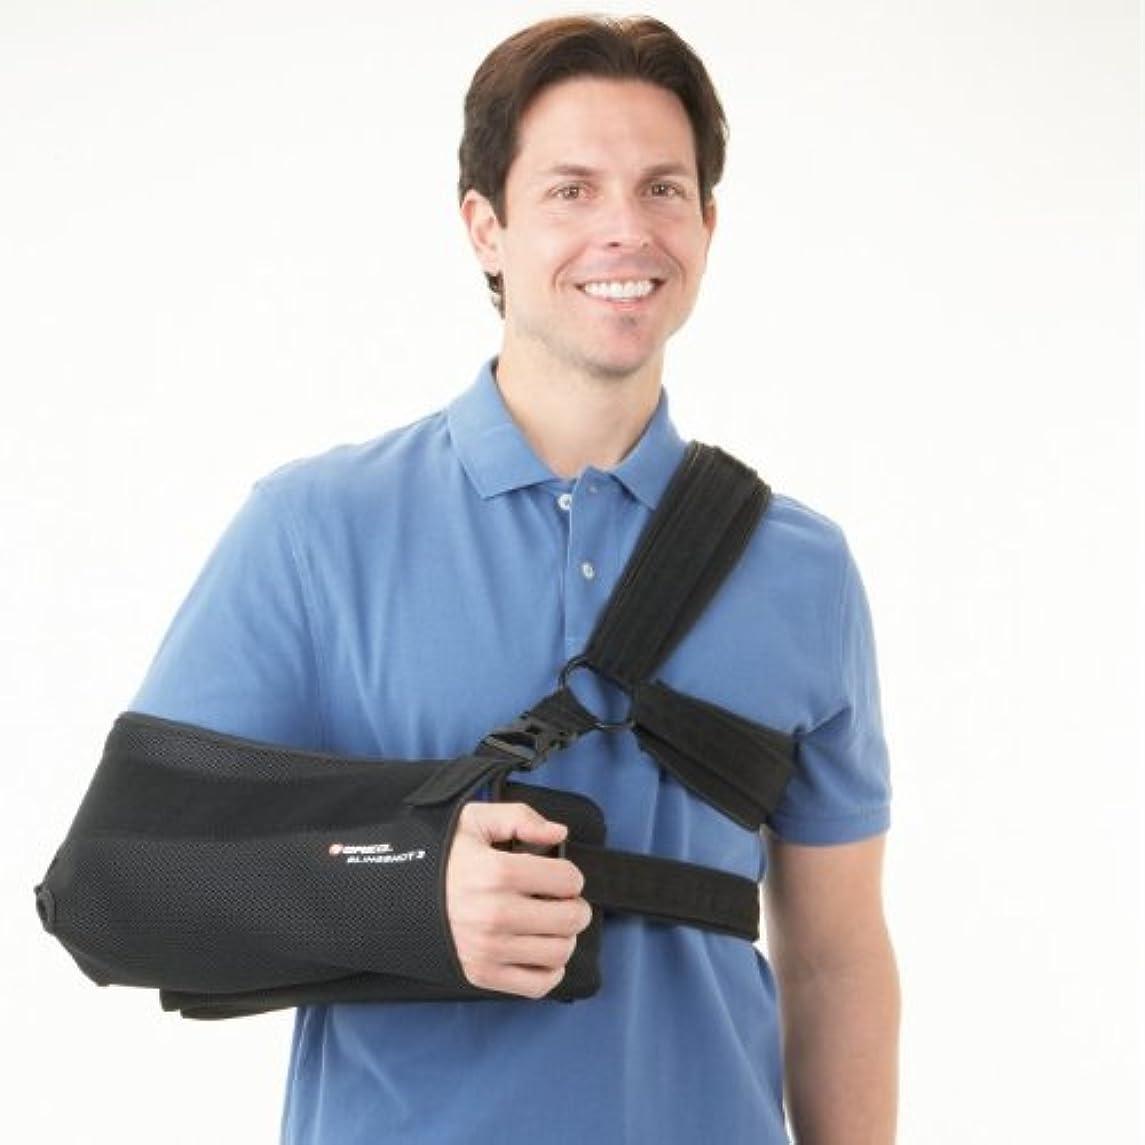 BREG '00043 Brace, Orthopedic, Medium 13.5-14.5